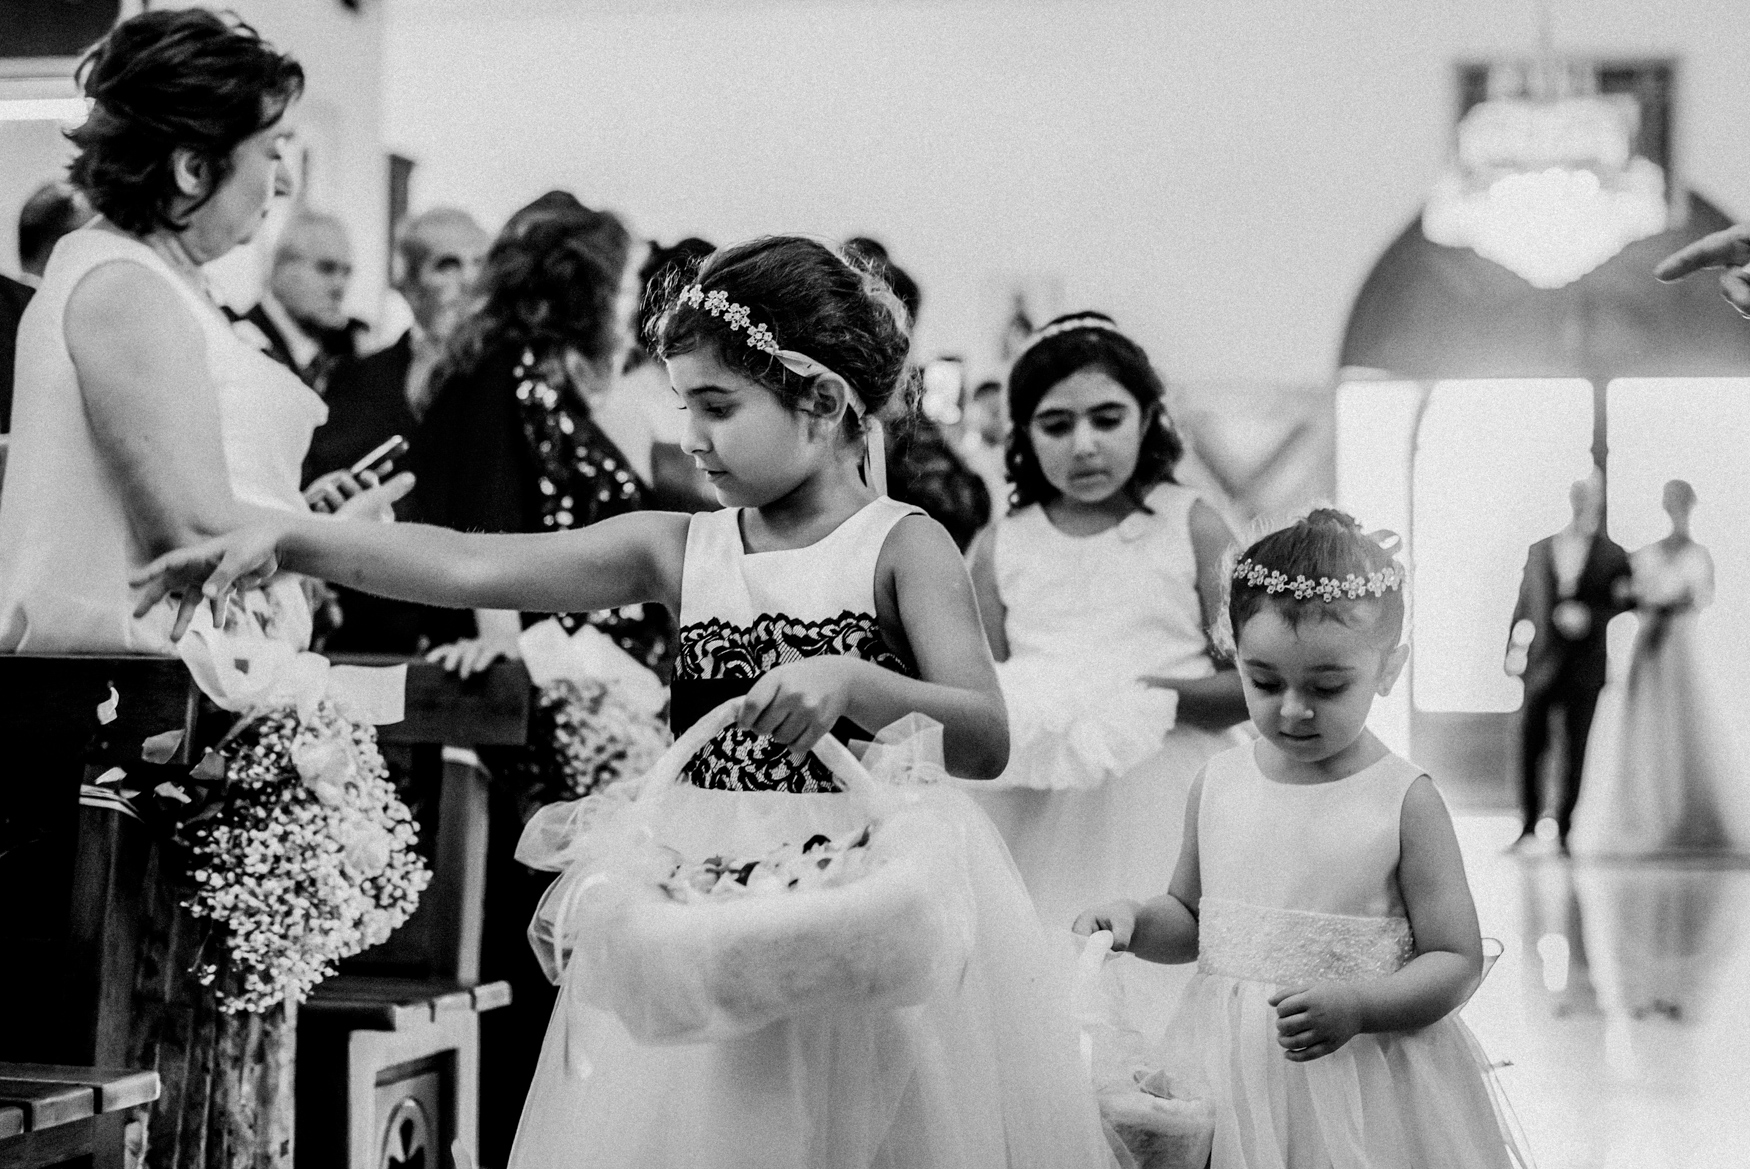 LR3 byblos beirut church wedding ceremony lebanon 001.jpg